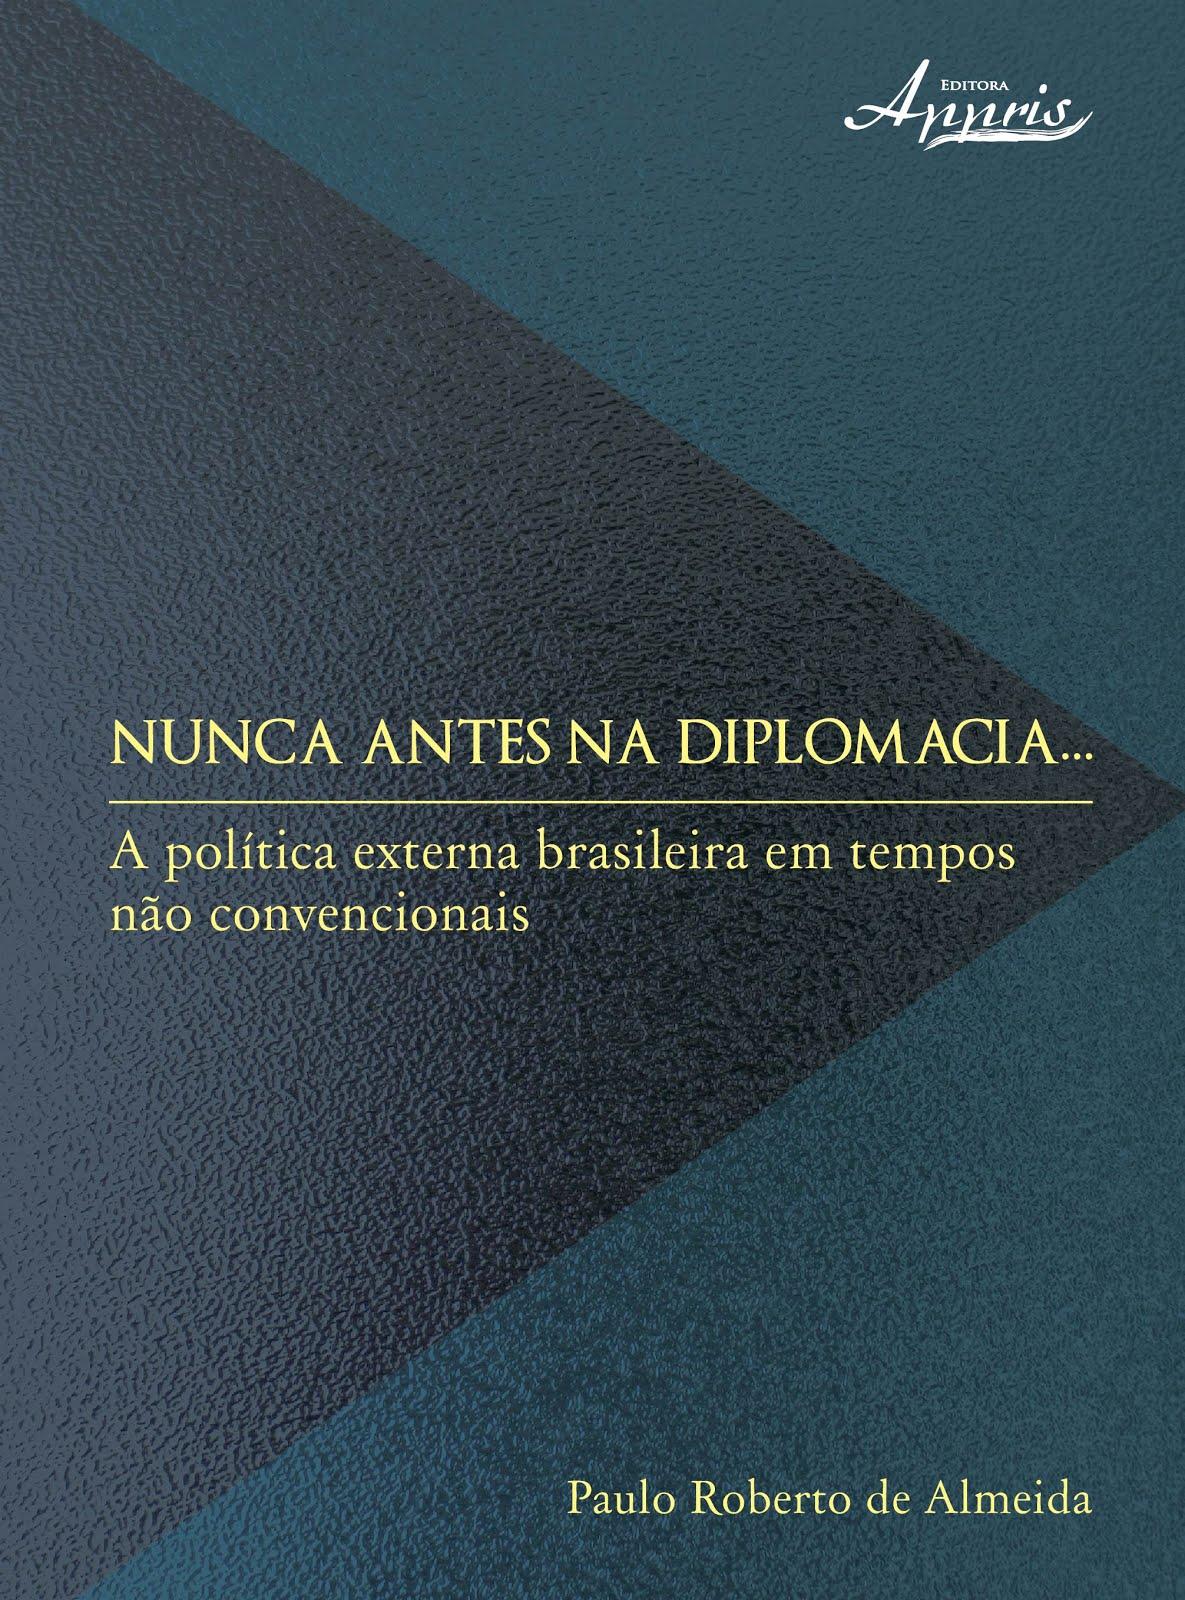 Nunca Antes na Diplomacia (livro PRA)